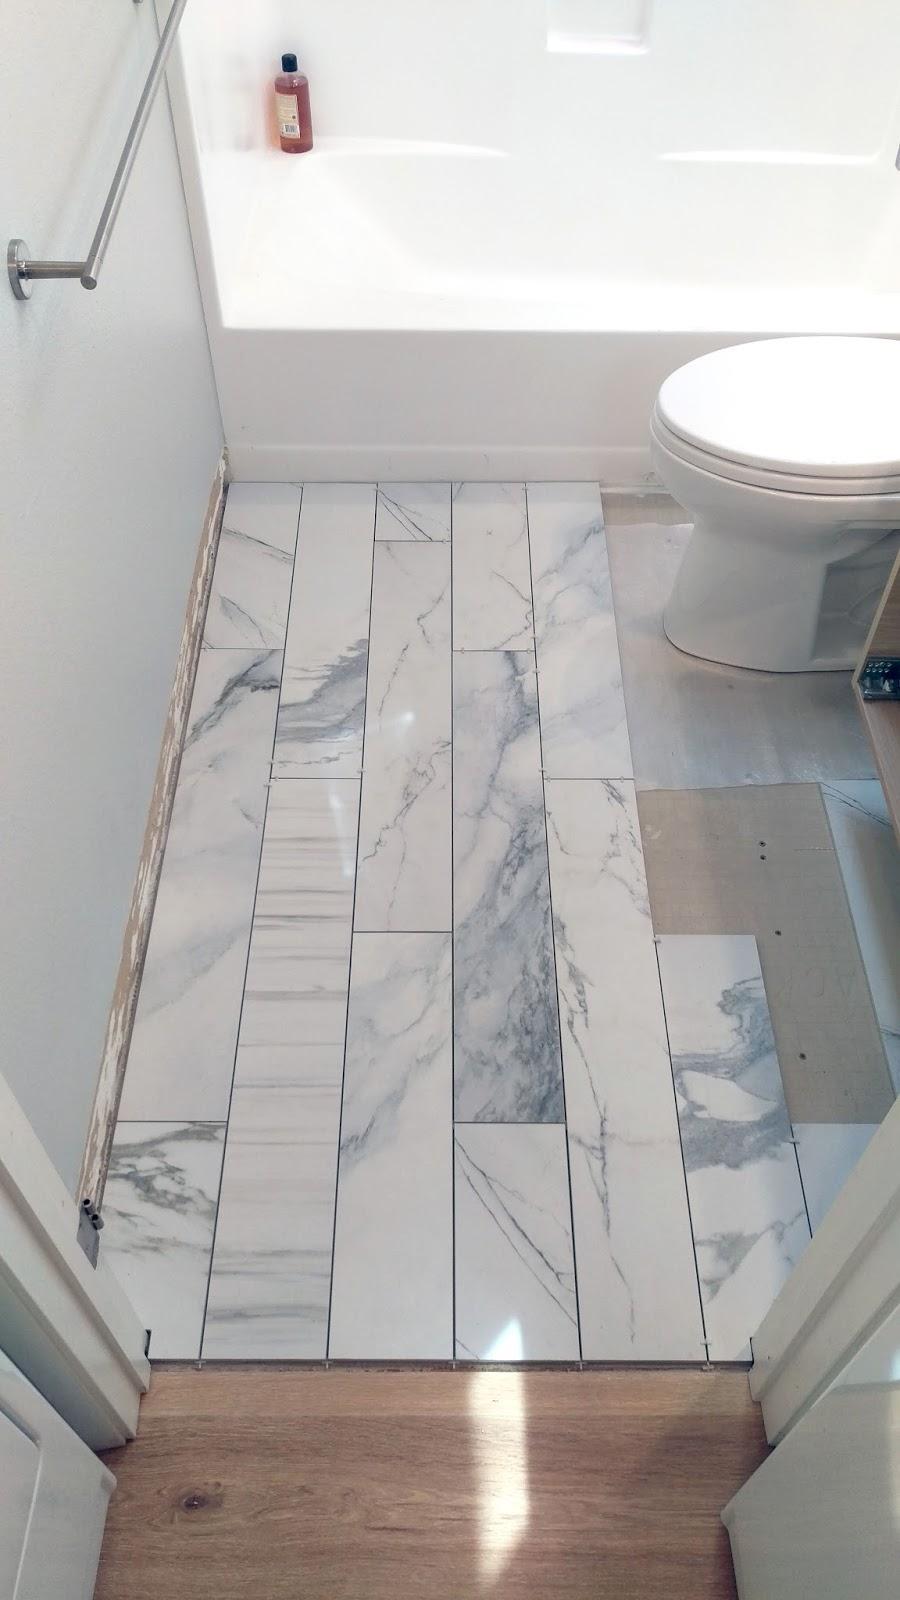 http://dfurseth.blogspot.com/: Bathroom Tile Project